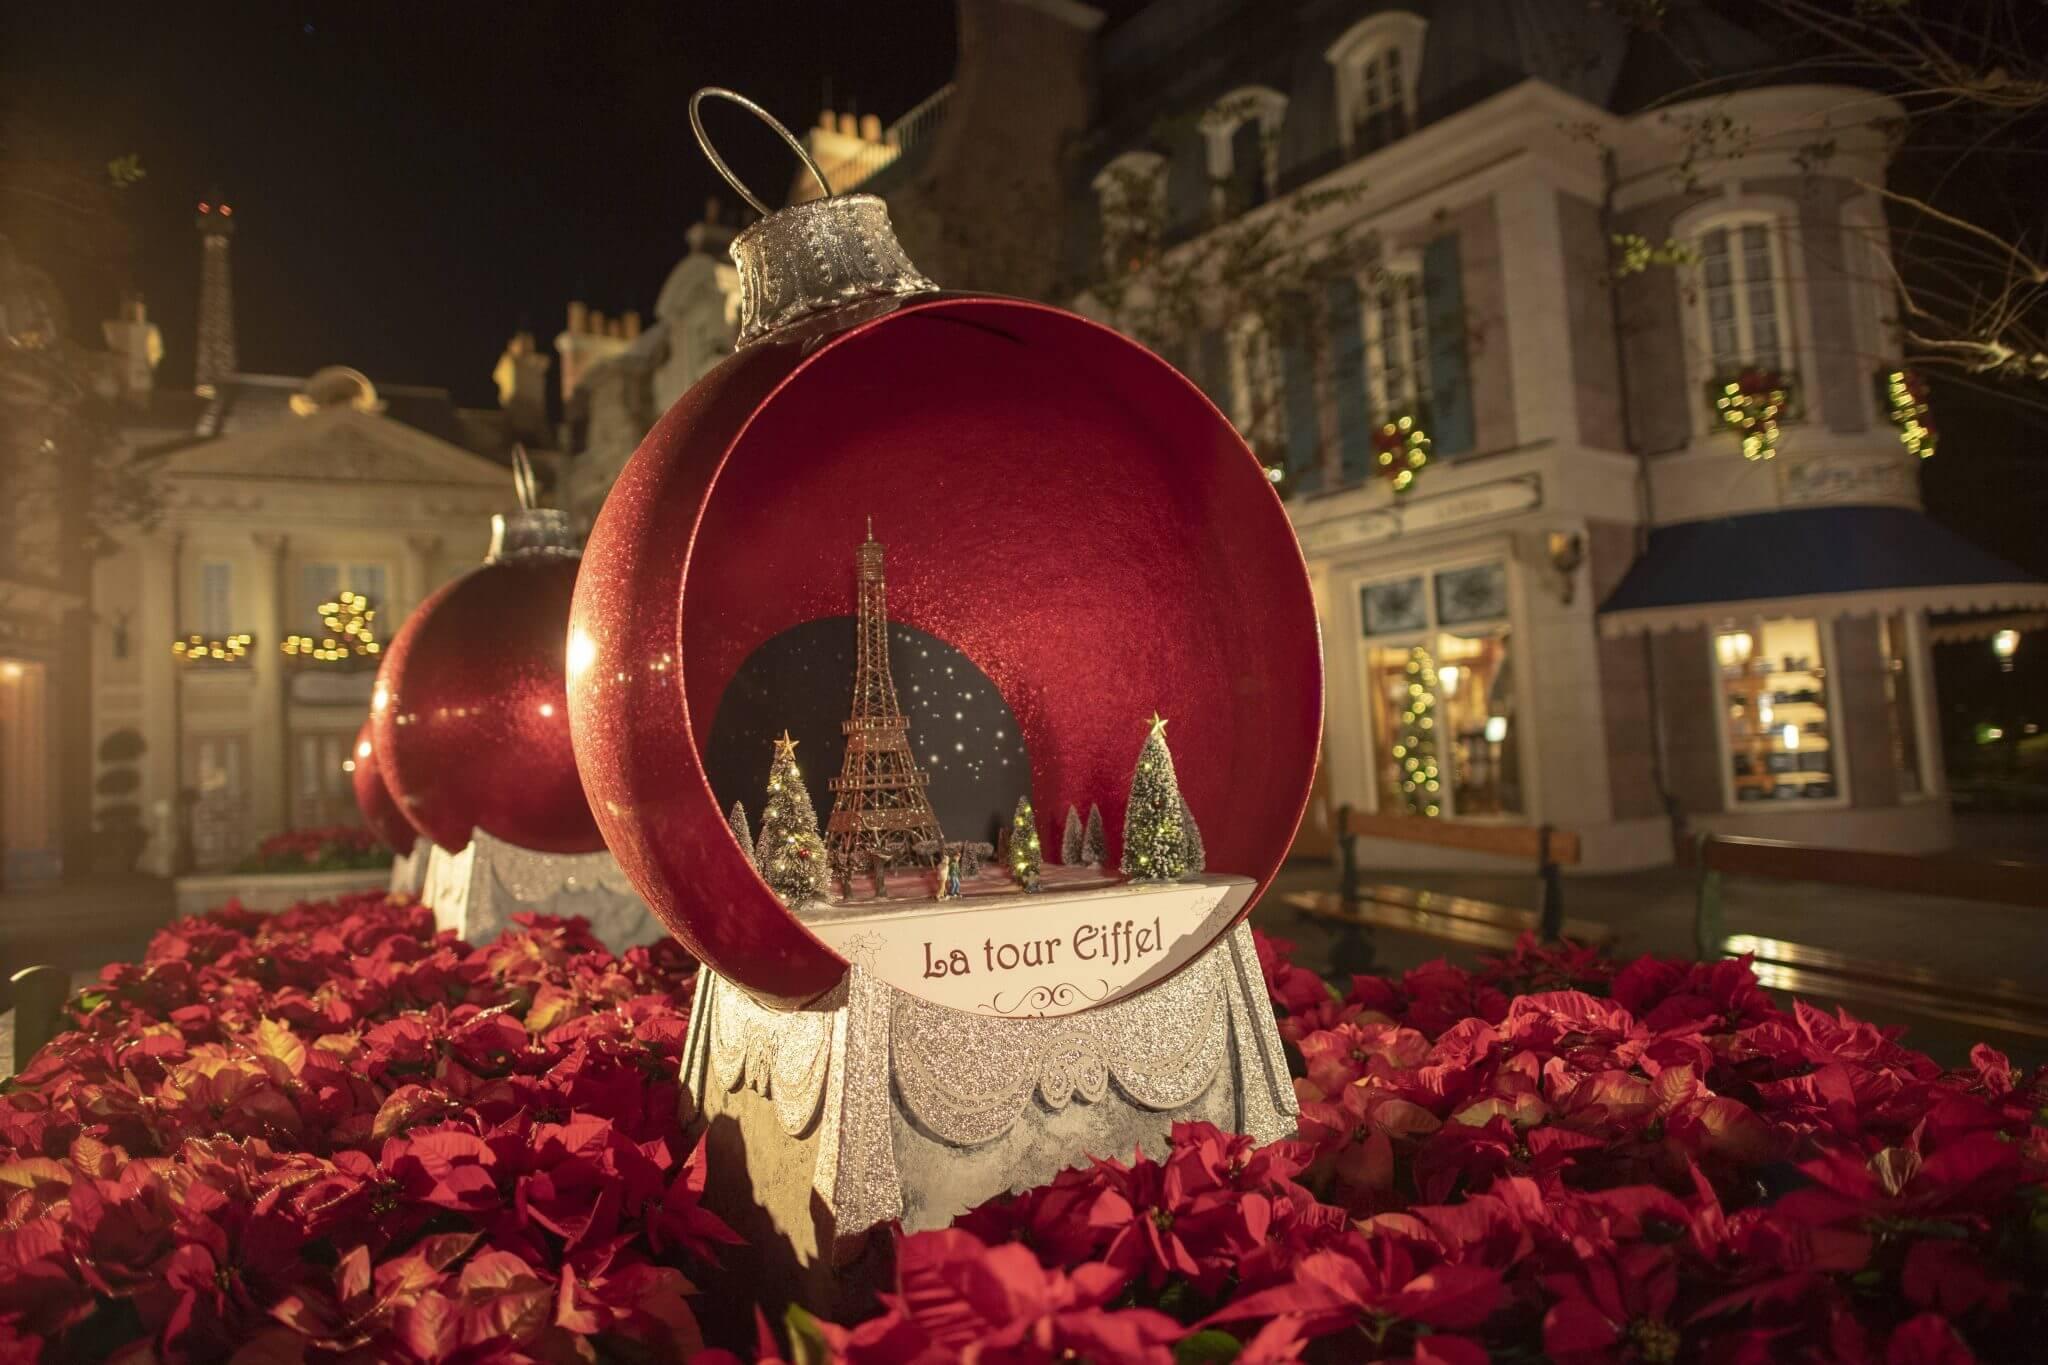 Disneyc Christmas Decoration Epcot Festival of the Holidays